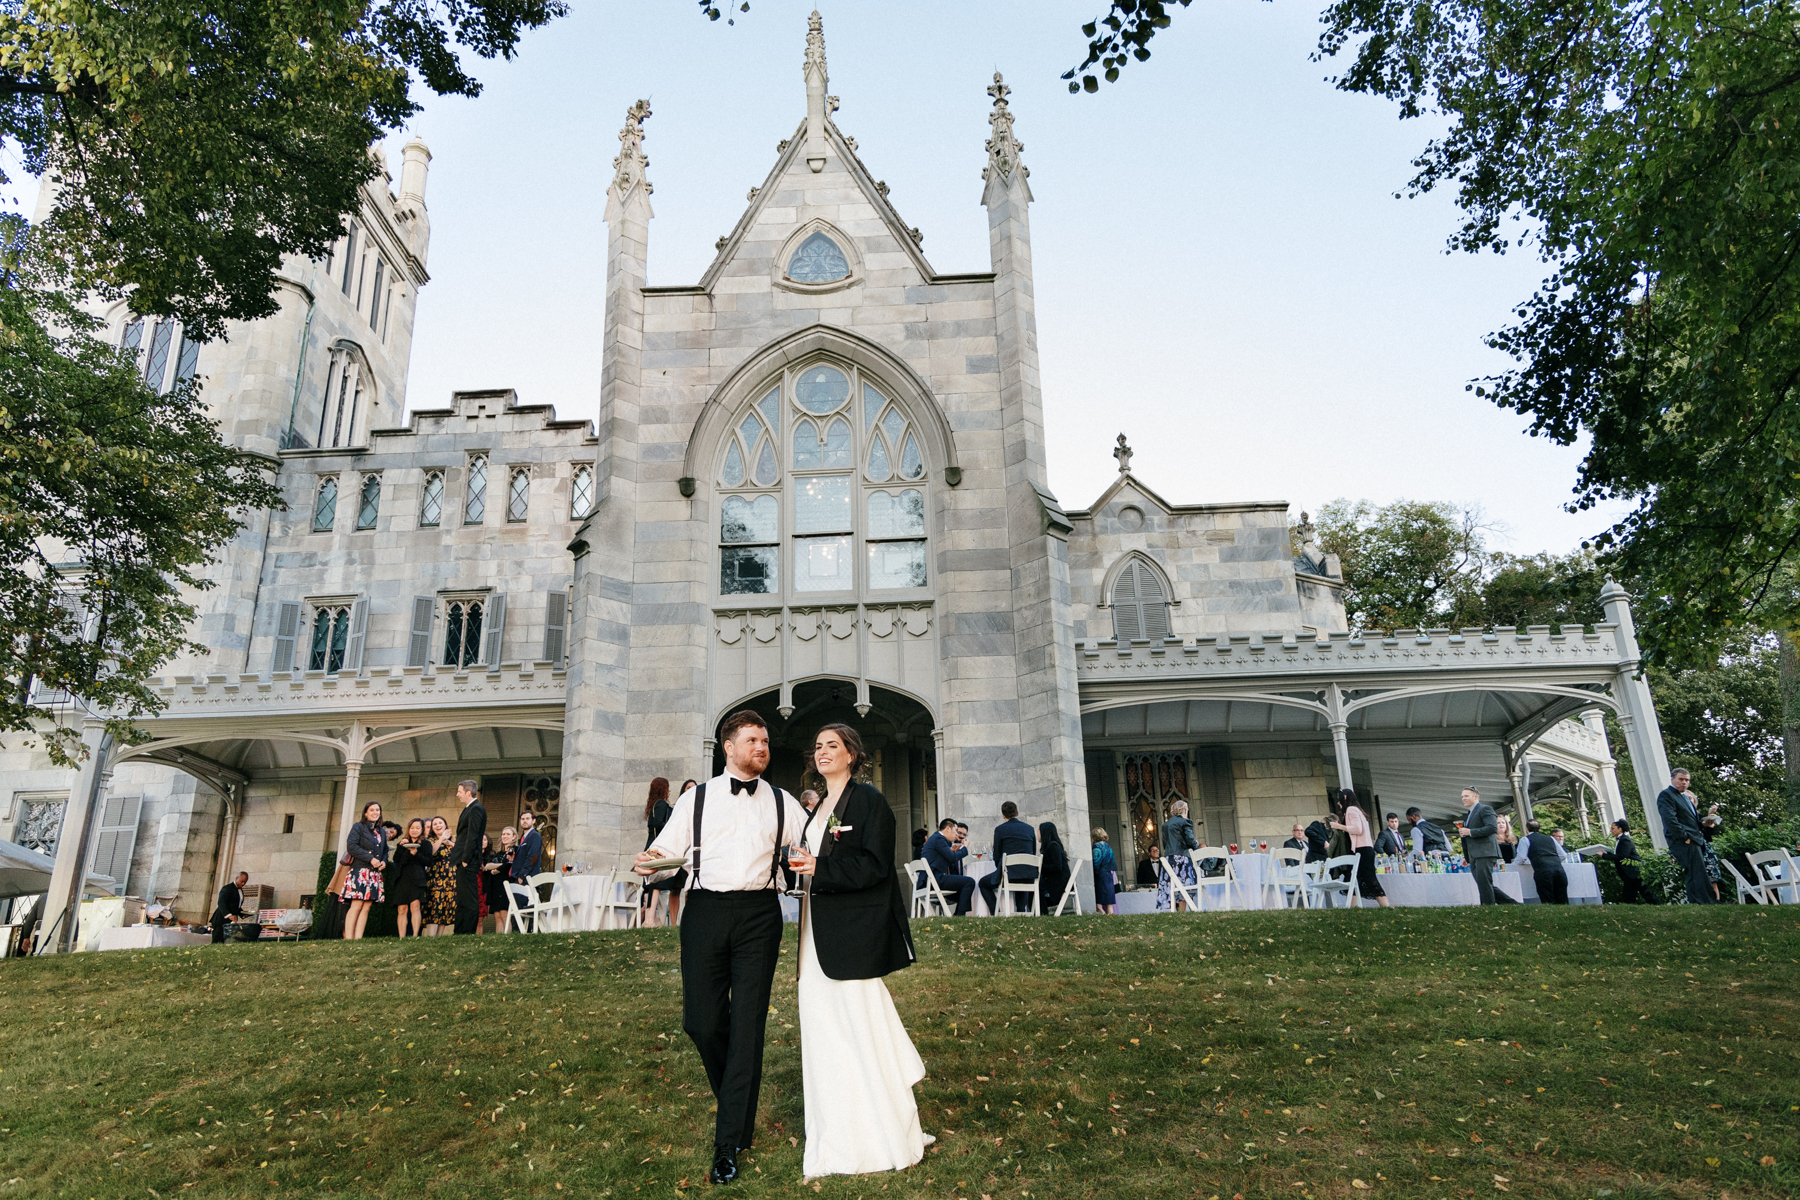 CHRIS-JESSIE-LYNDHURST-MANSION-WEDDING-PHOTOGRAPHER-APRIL-RENAE